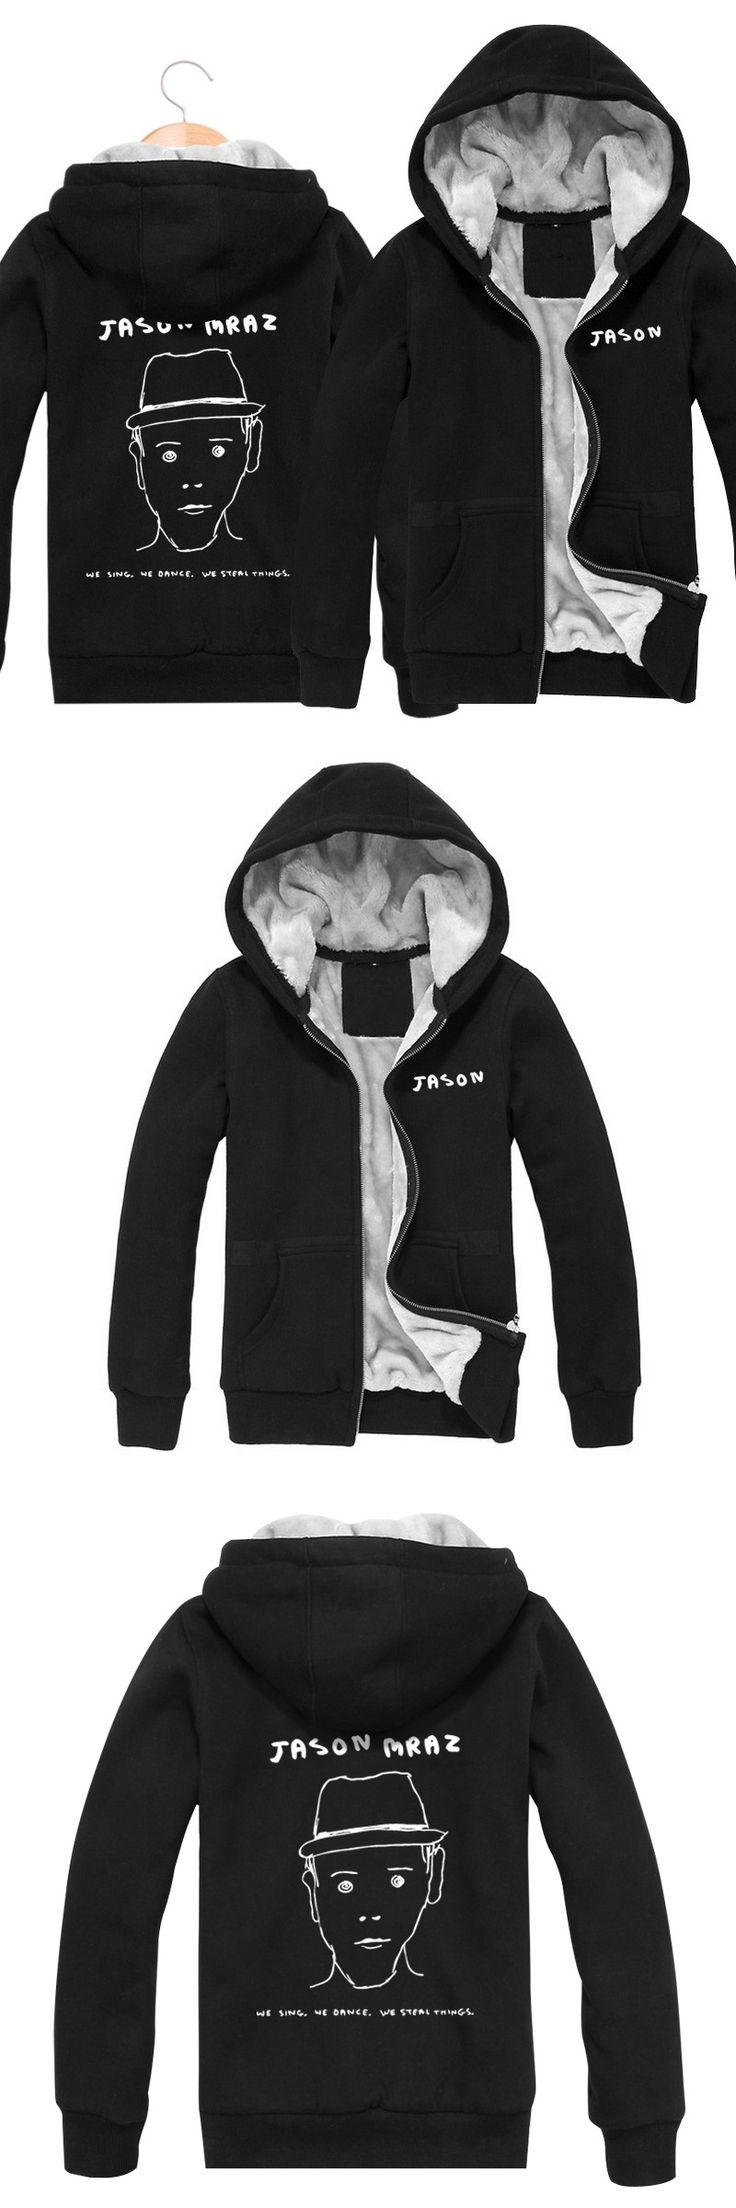 Wholesale New 2017 Winter Black Sweatshirt Fashion Hip Hop Zip Thickening  Velvet Jacket Jason Rock Band Hoodies Men Brand